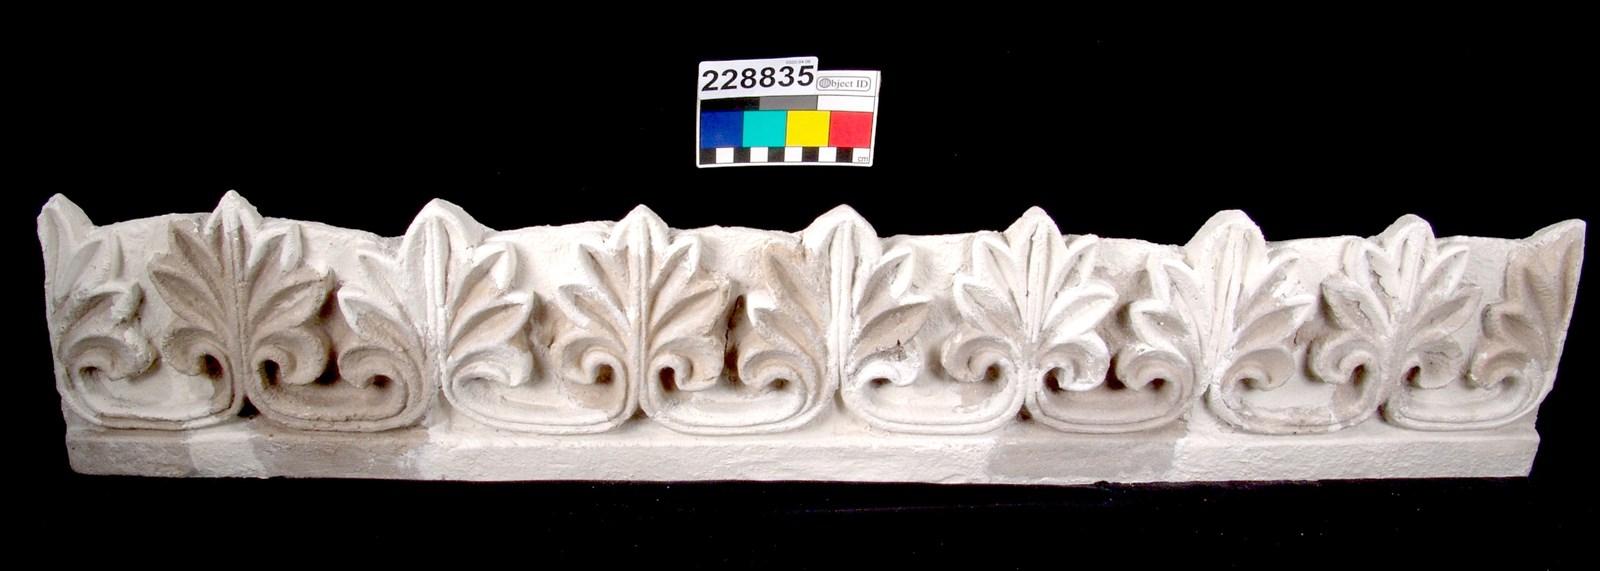 Toucan tile mold plaster cement bird  travertine casting mould